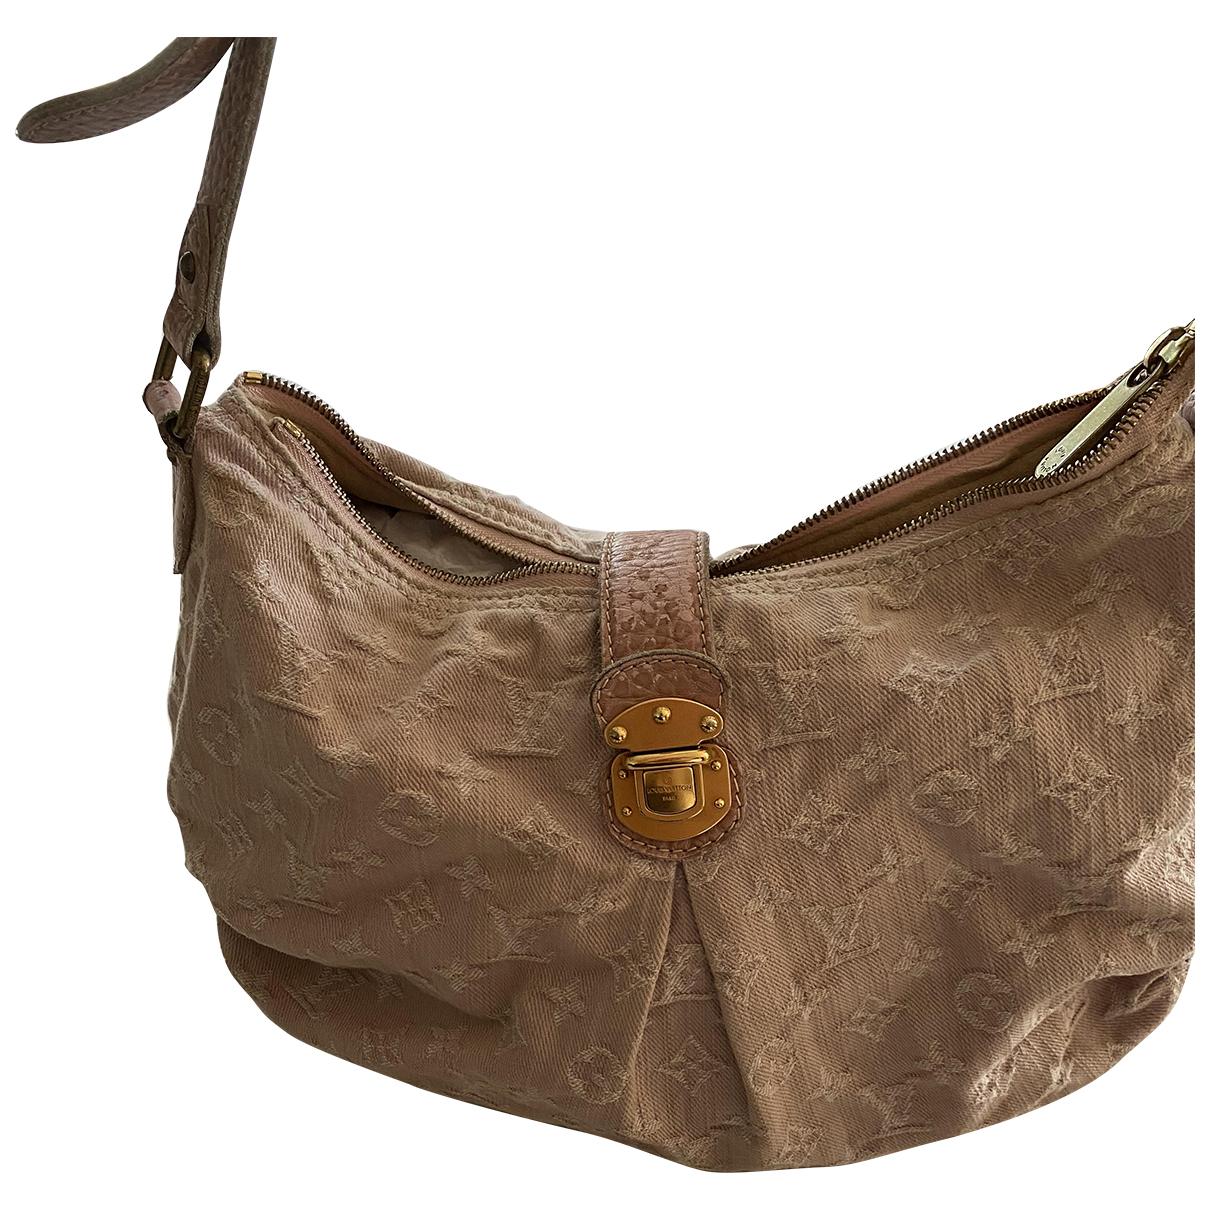 Louis Vuitton N Pink Denim - Jeans handbag for Women N